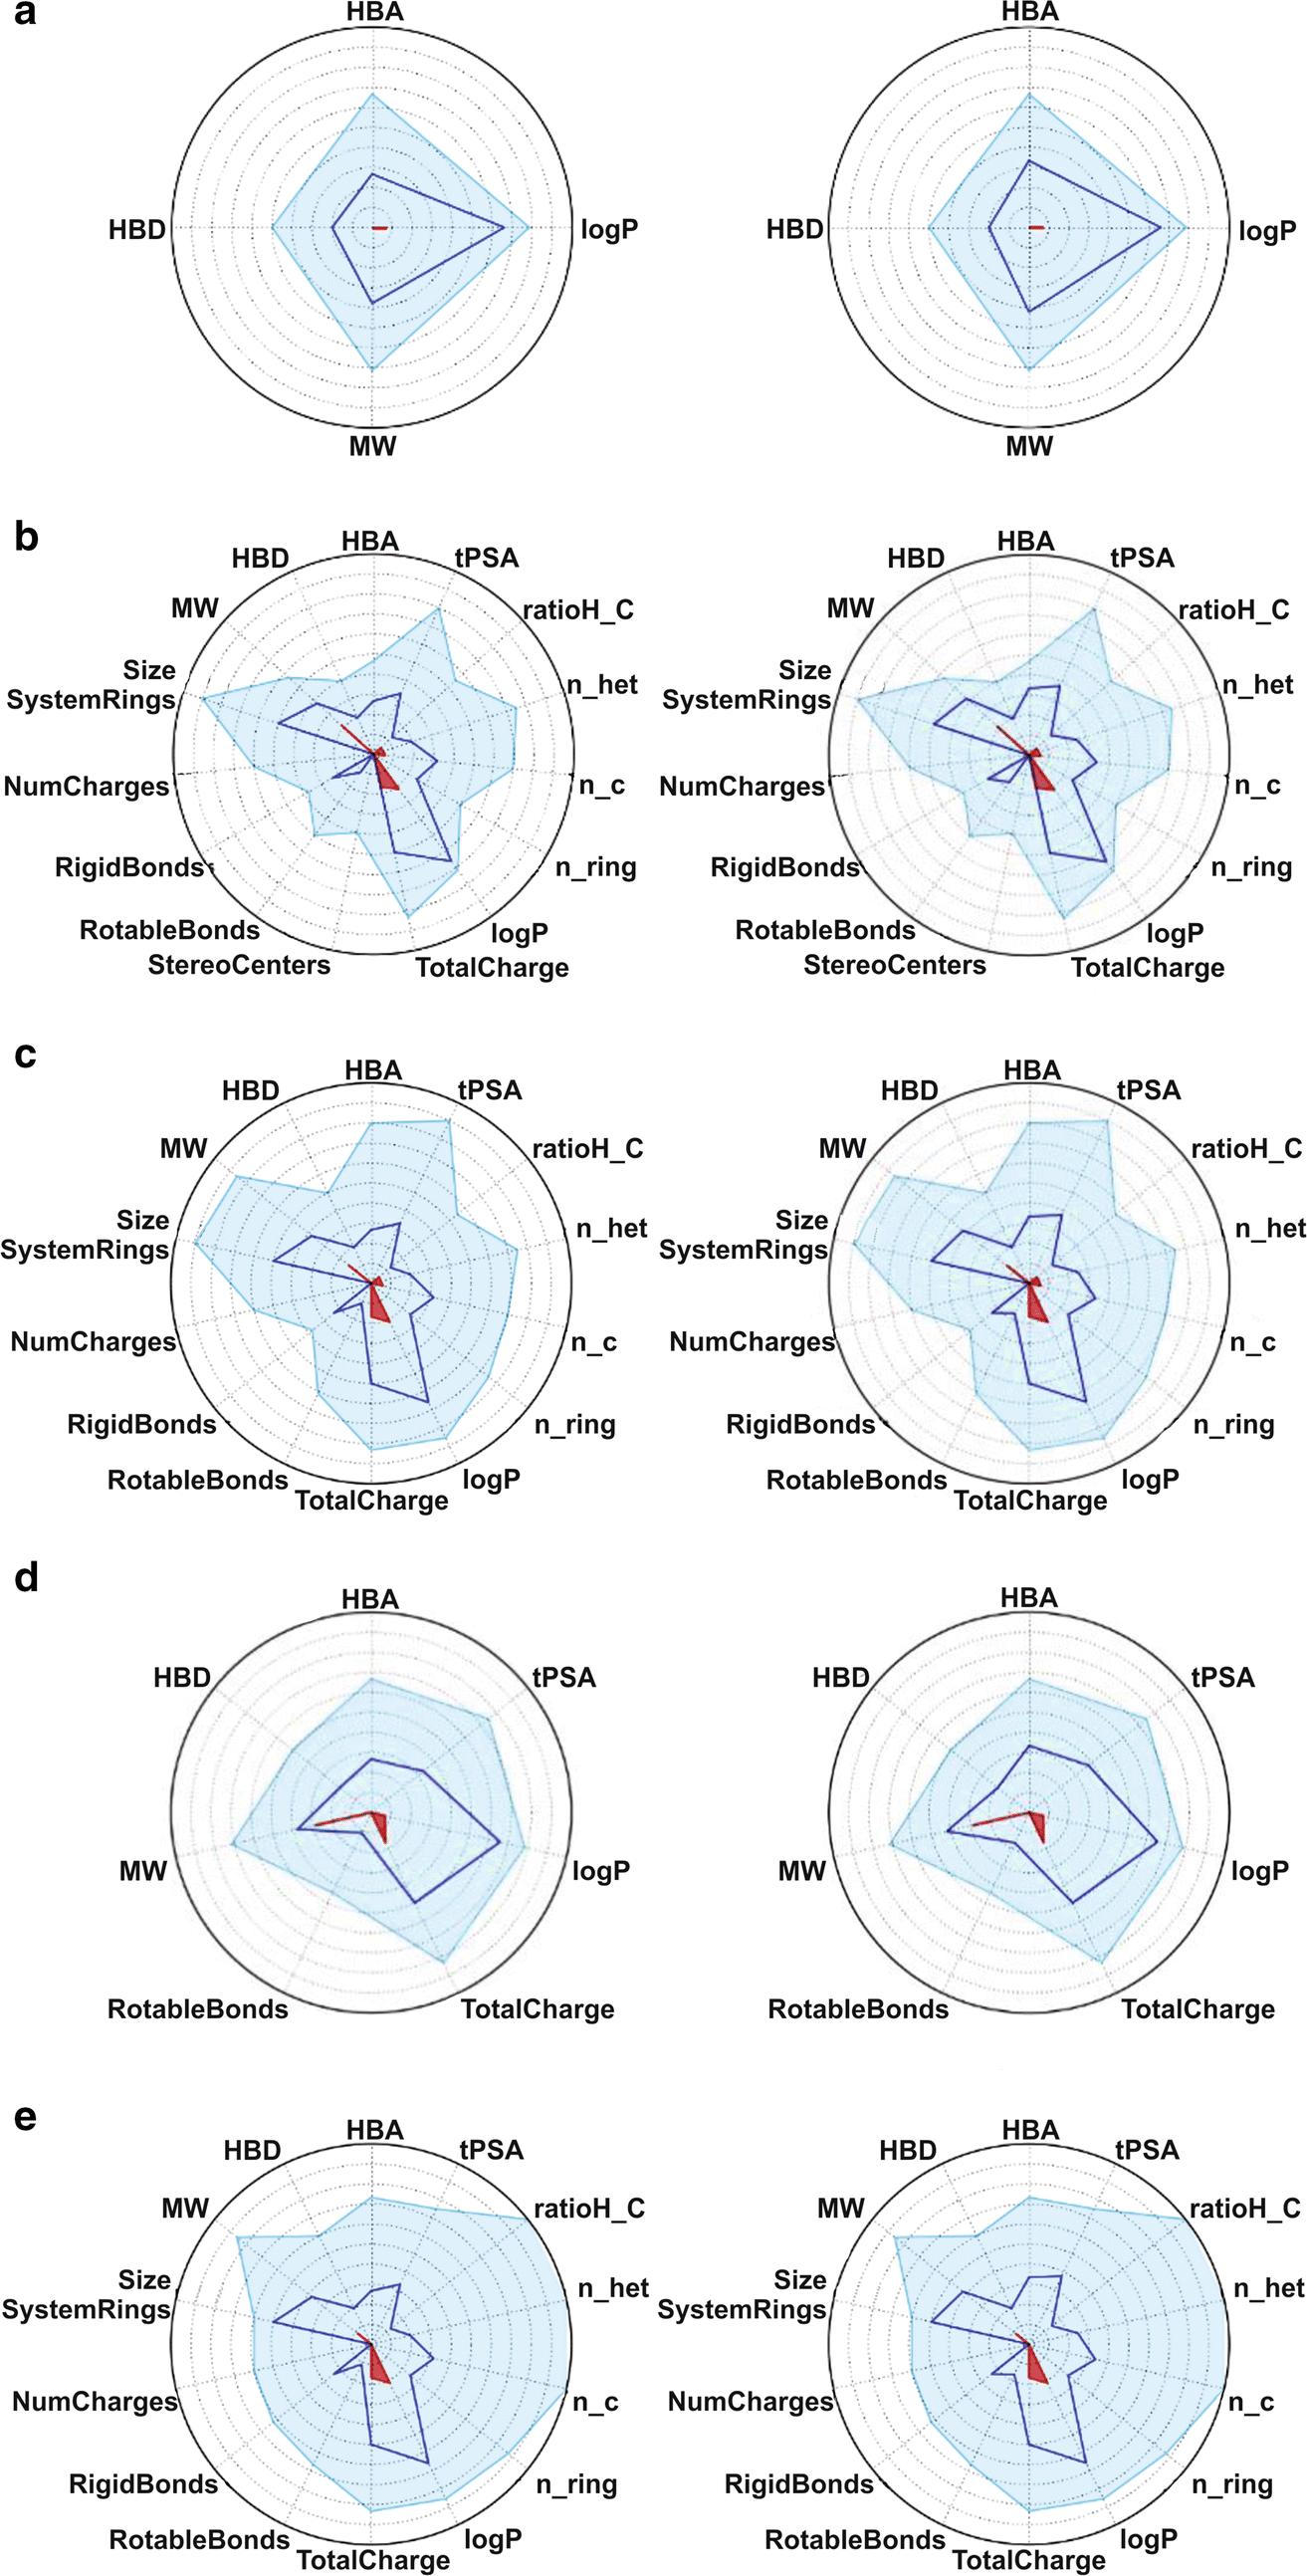 a1ca44be4 In vitro antiplasmodial activity